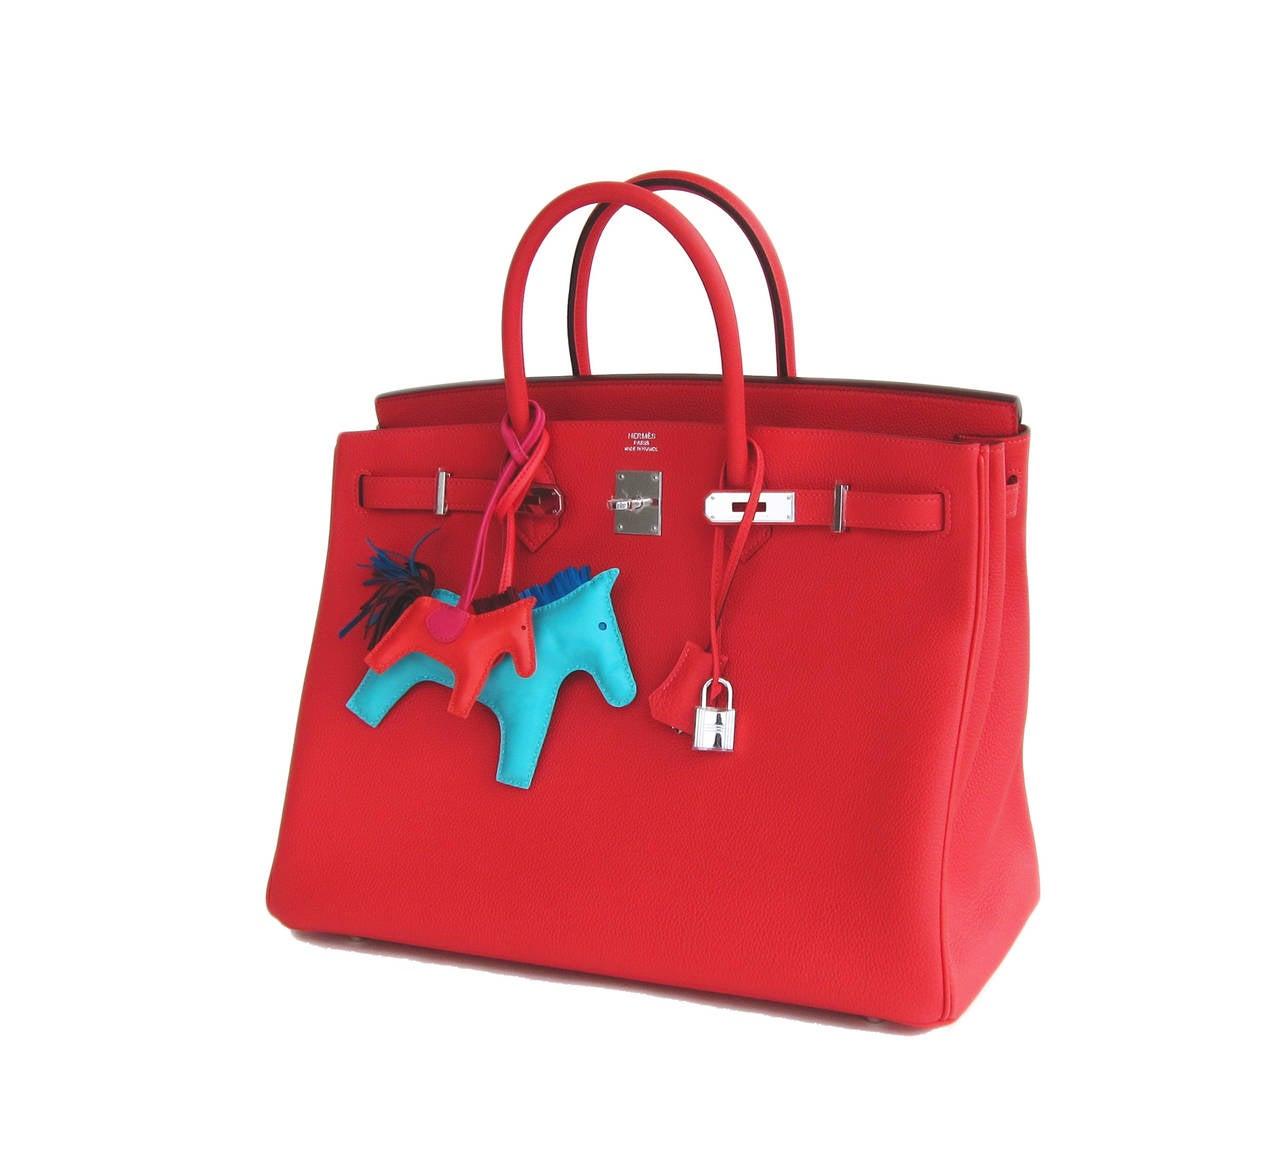 Women's or Men's Hermes Rouge Pivoine 40cm Togo Birkin Bag Palladium Luscious For Sale